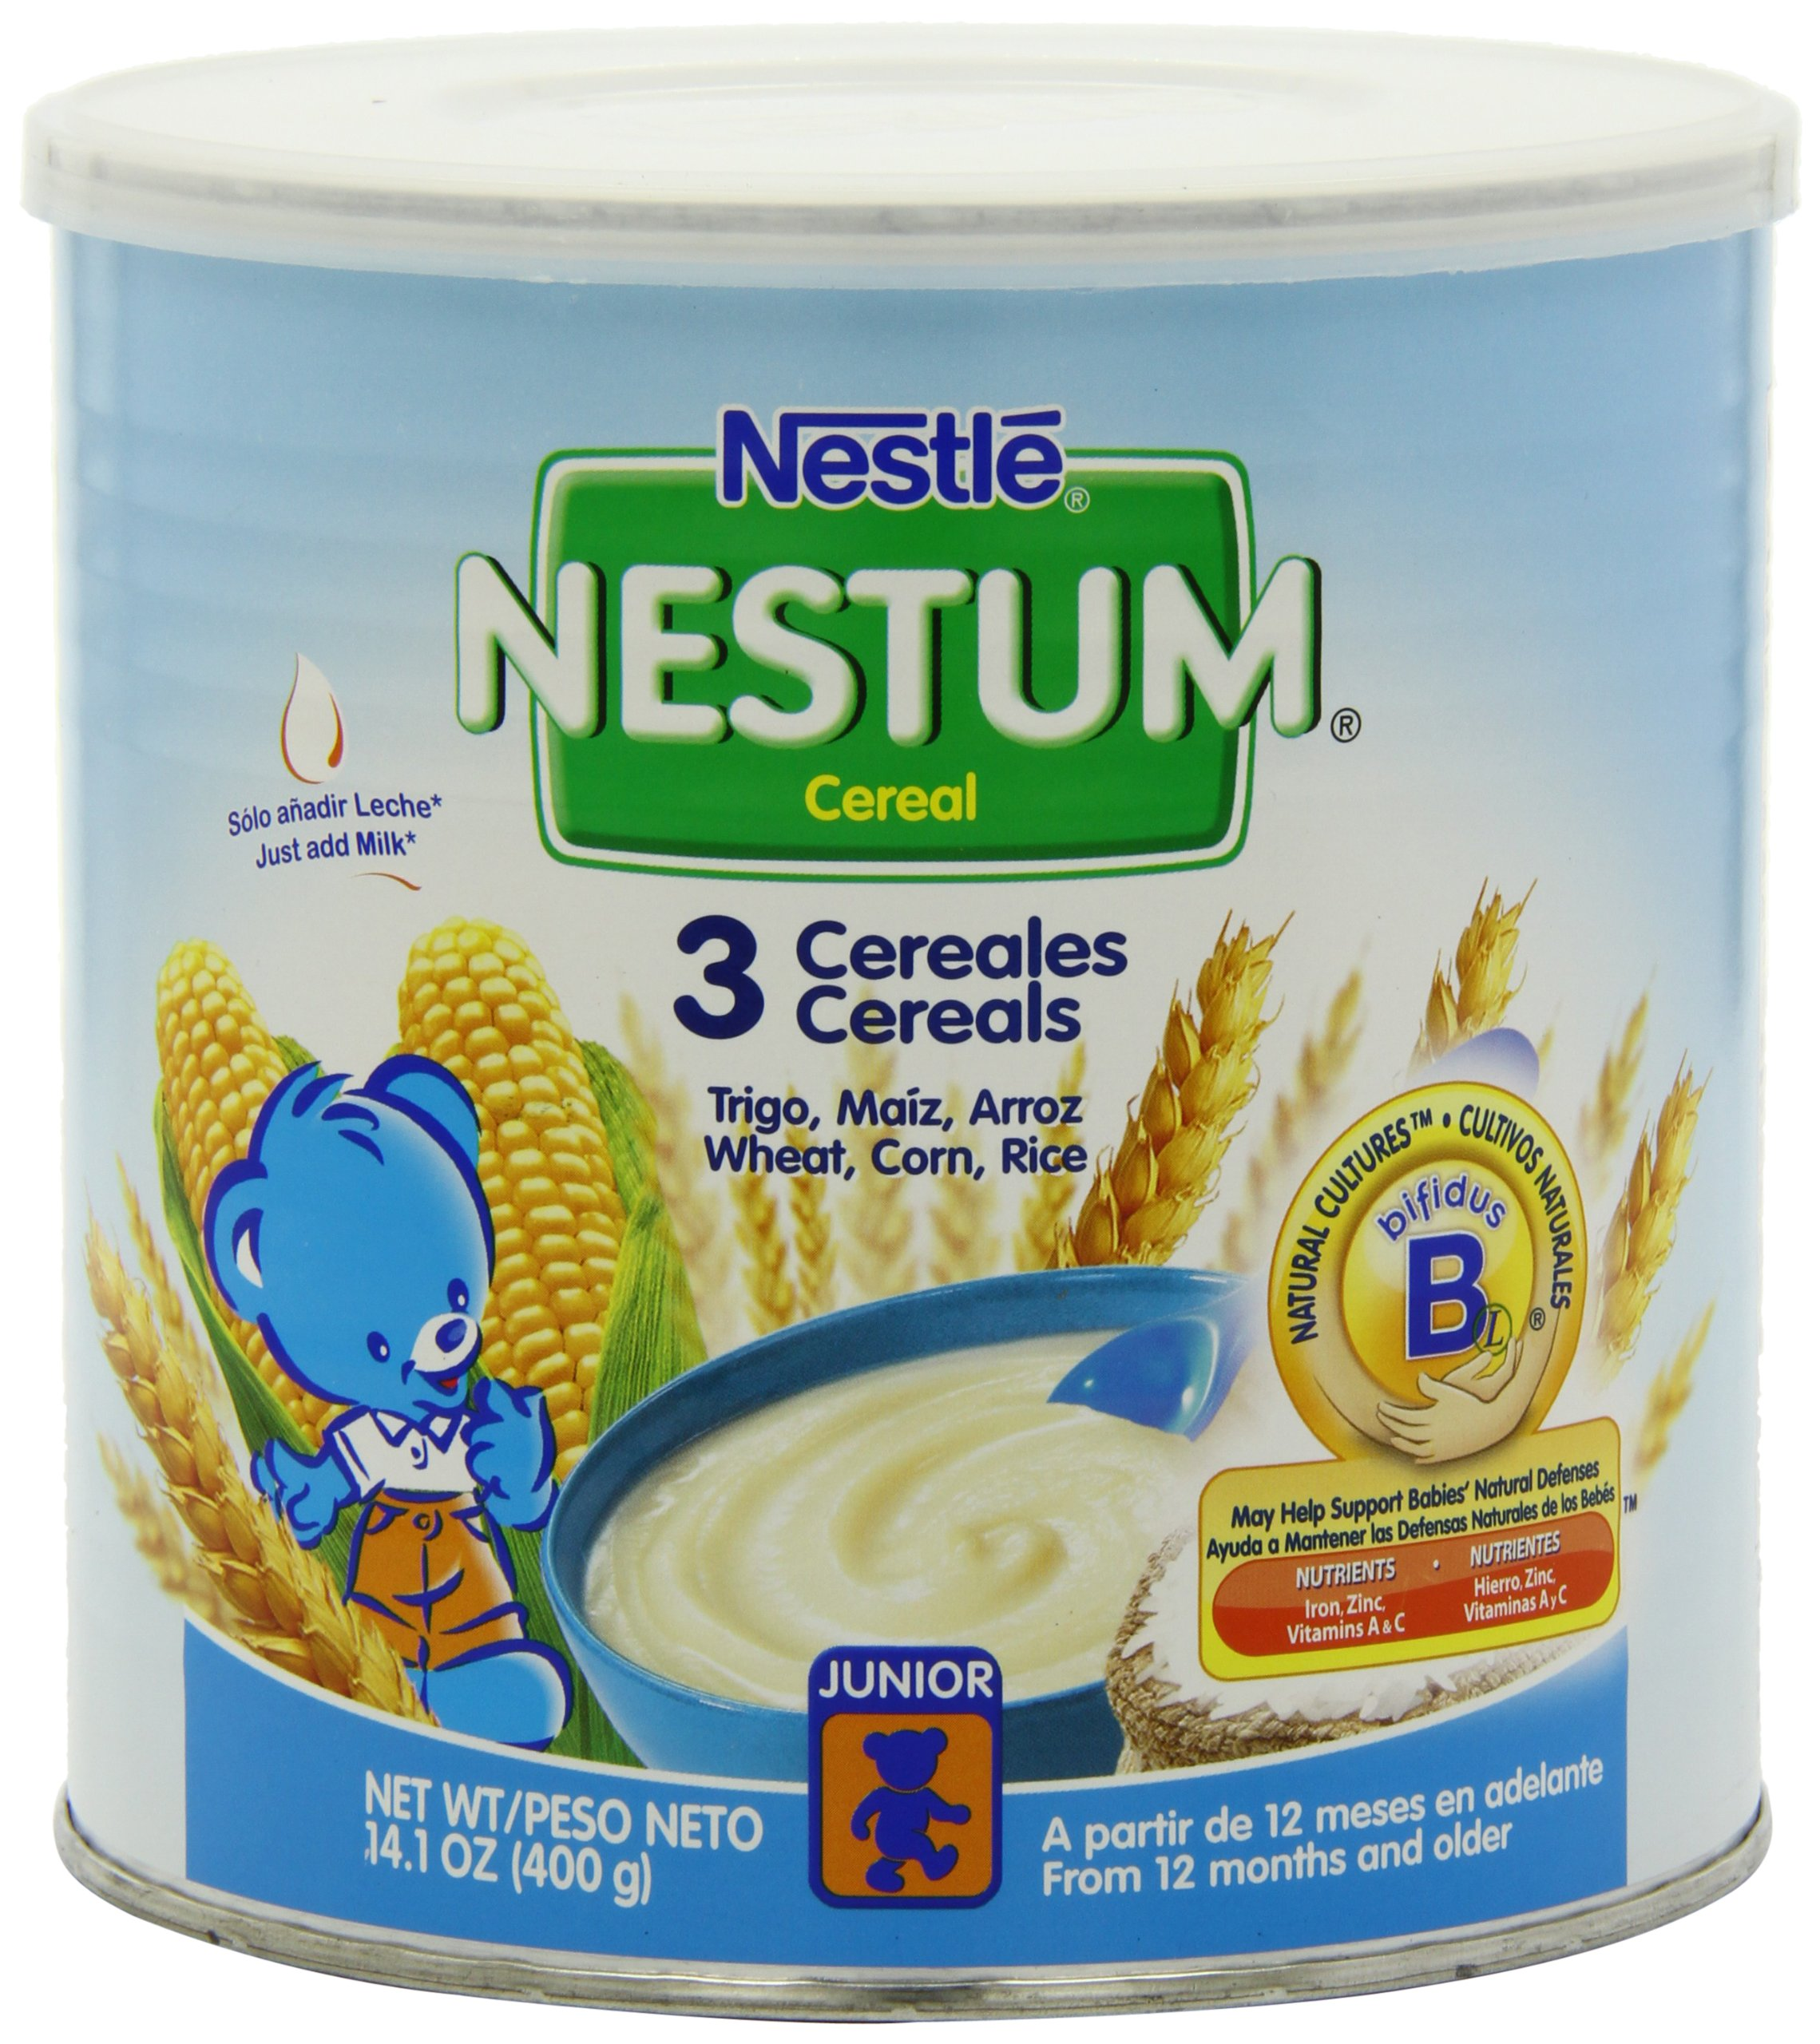 Nestle Nestum 3 Cereals, 14.1-Ounce (Pack of 6) by Gerber Graduates